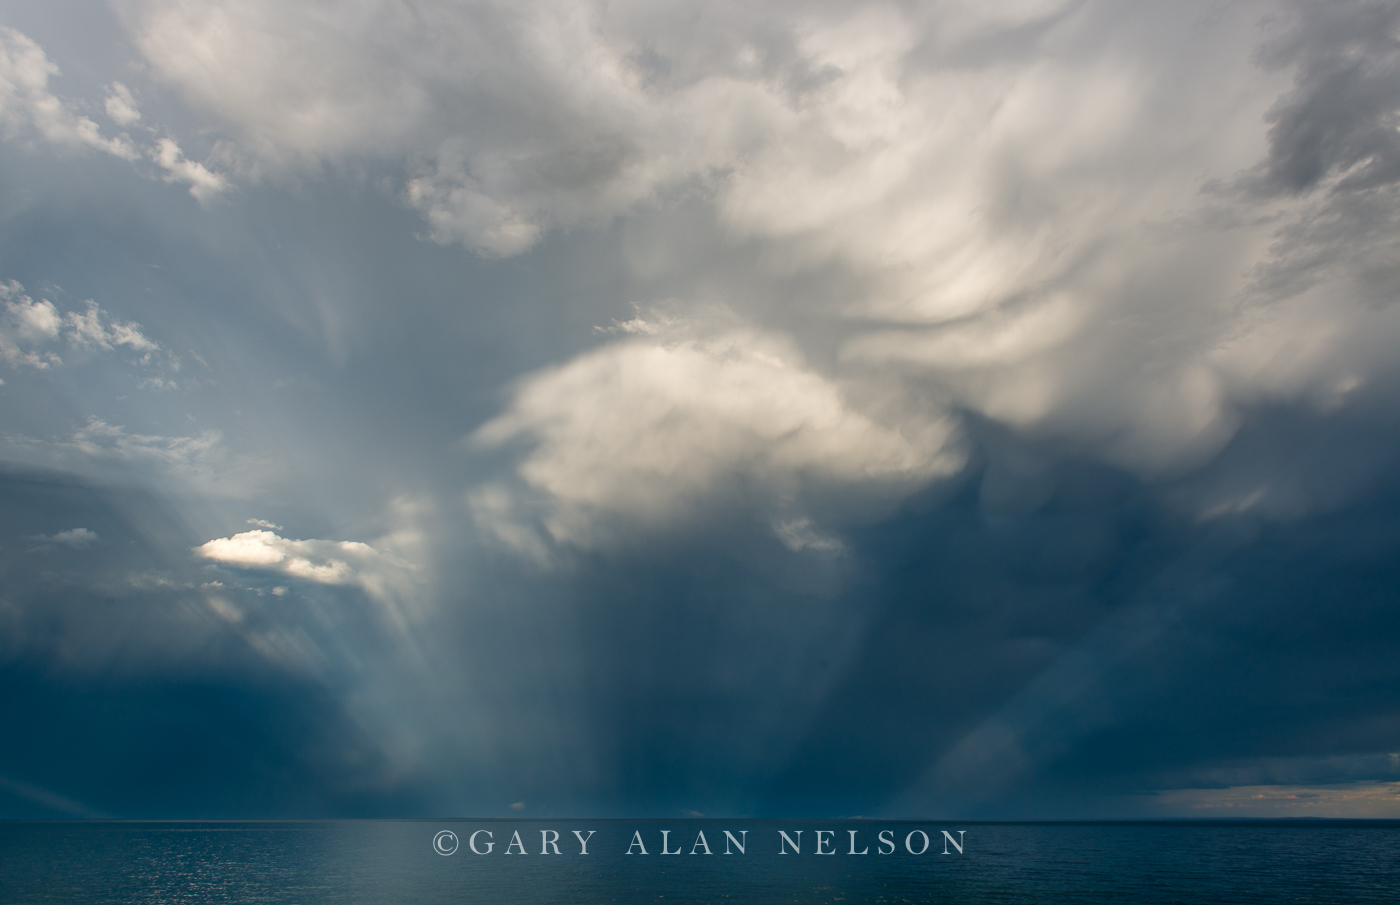 lake superior, minnesota, storm, clouds, photo